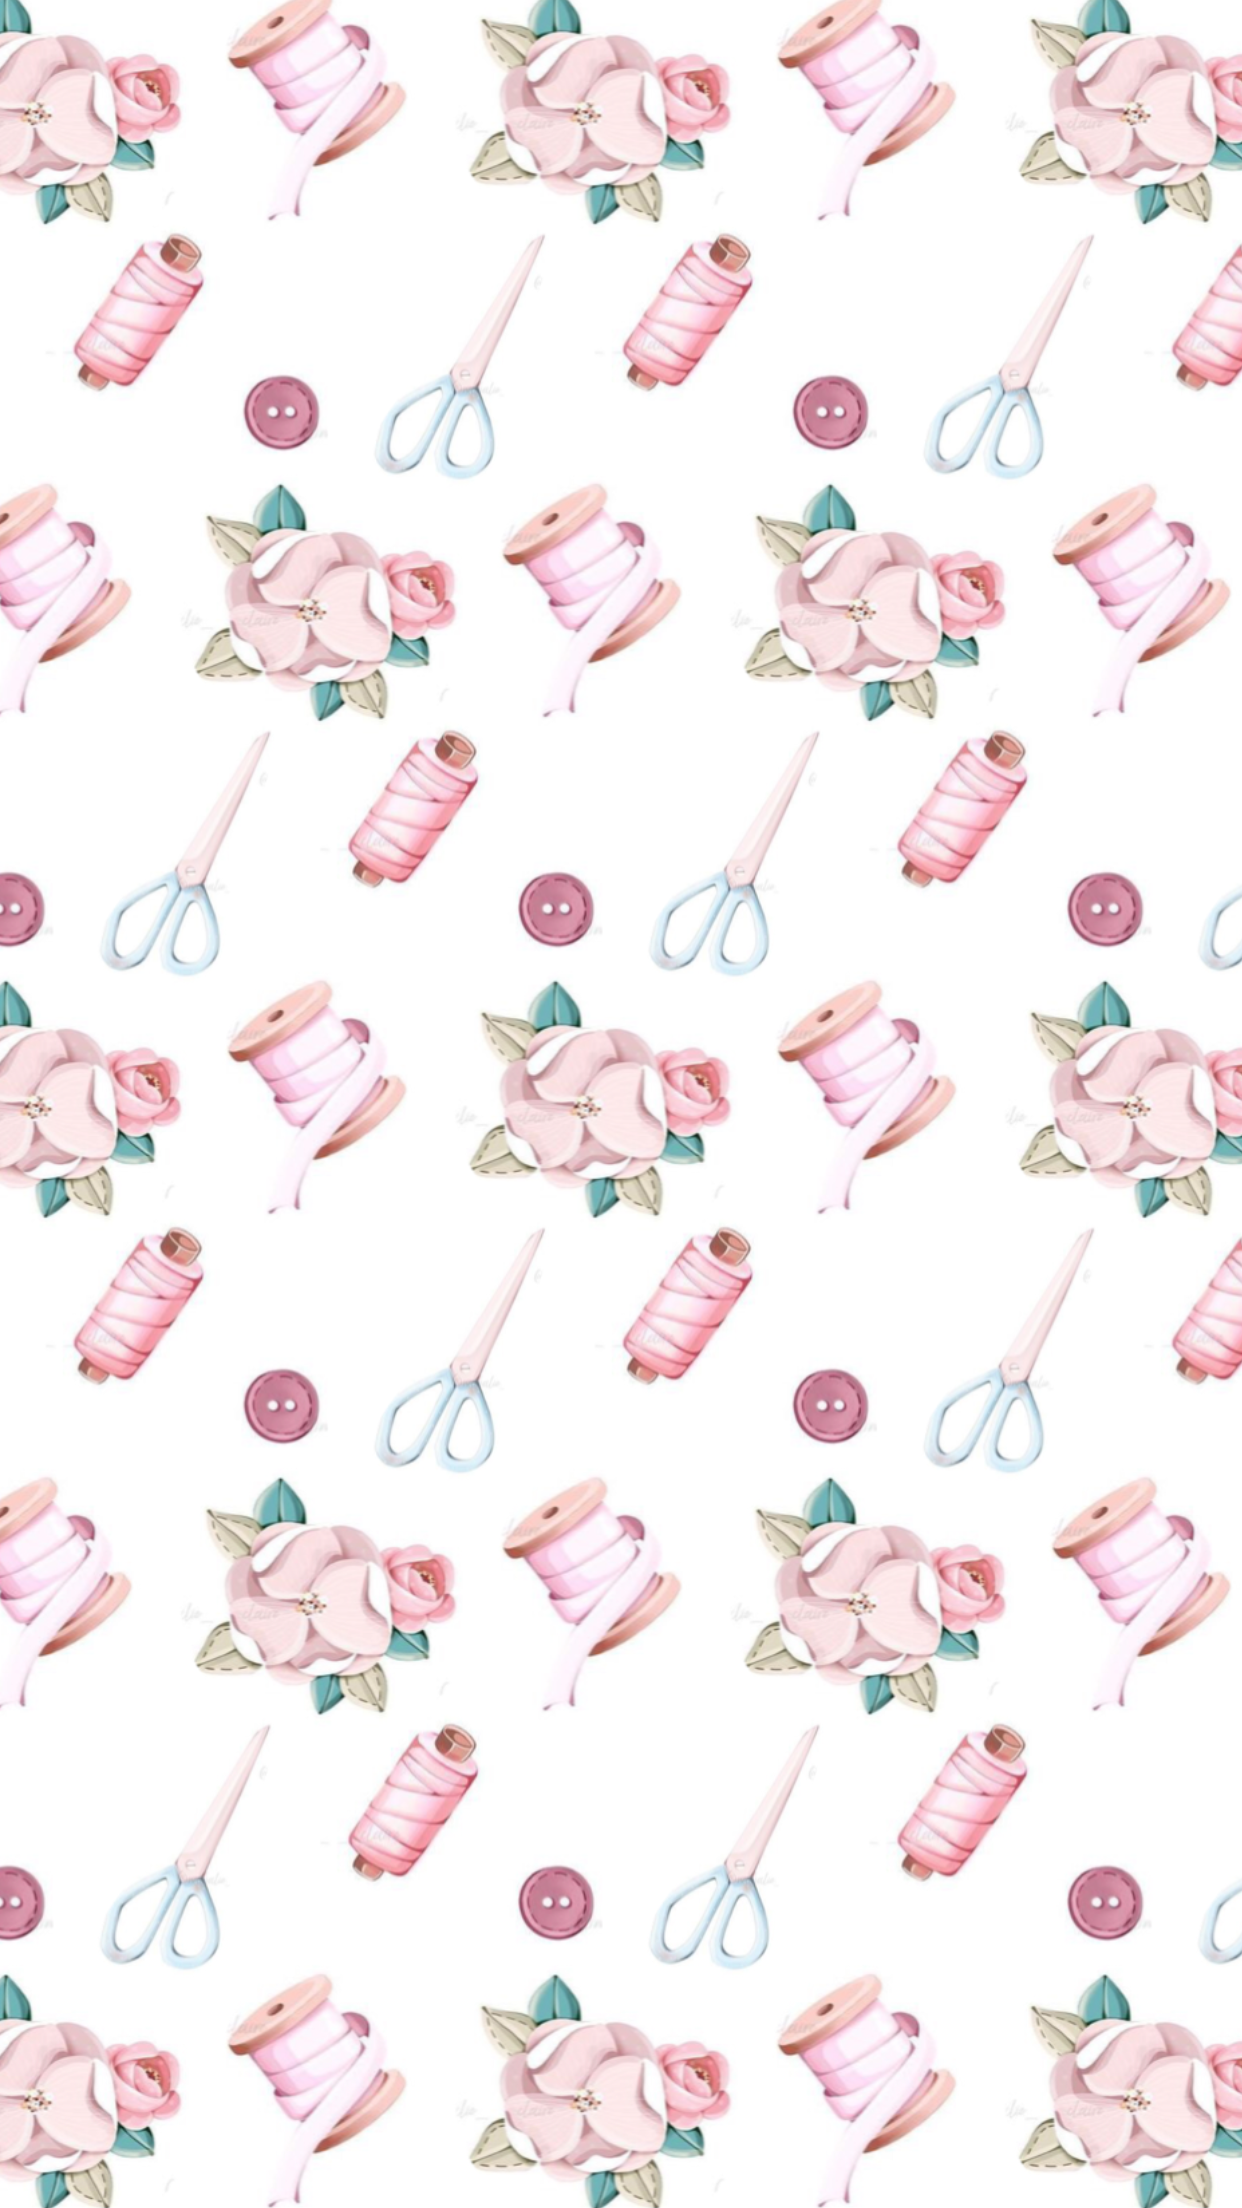 Pin by Corina Conduto on Wallpaper 6 Girly Pinterest